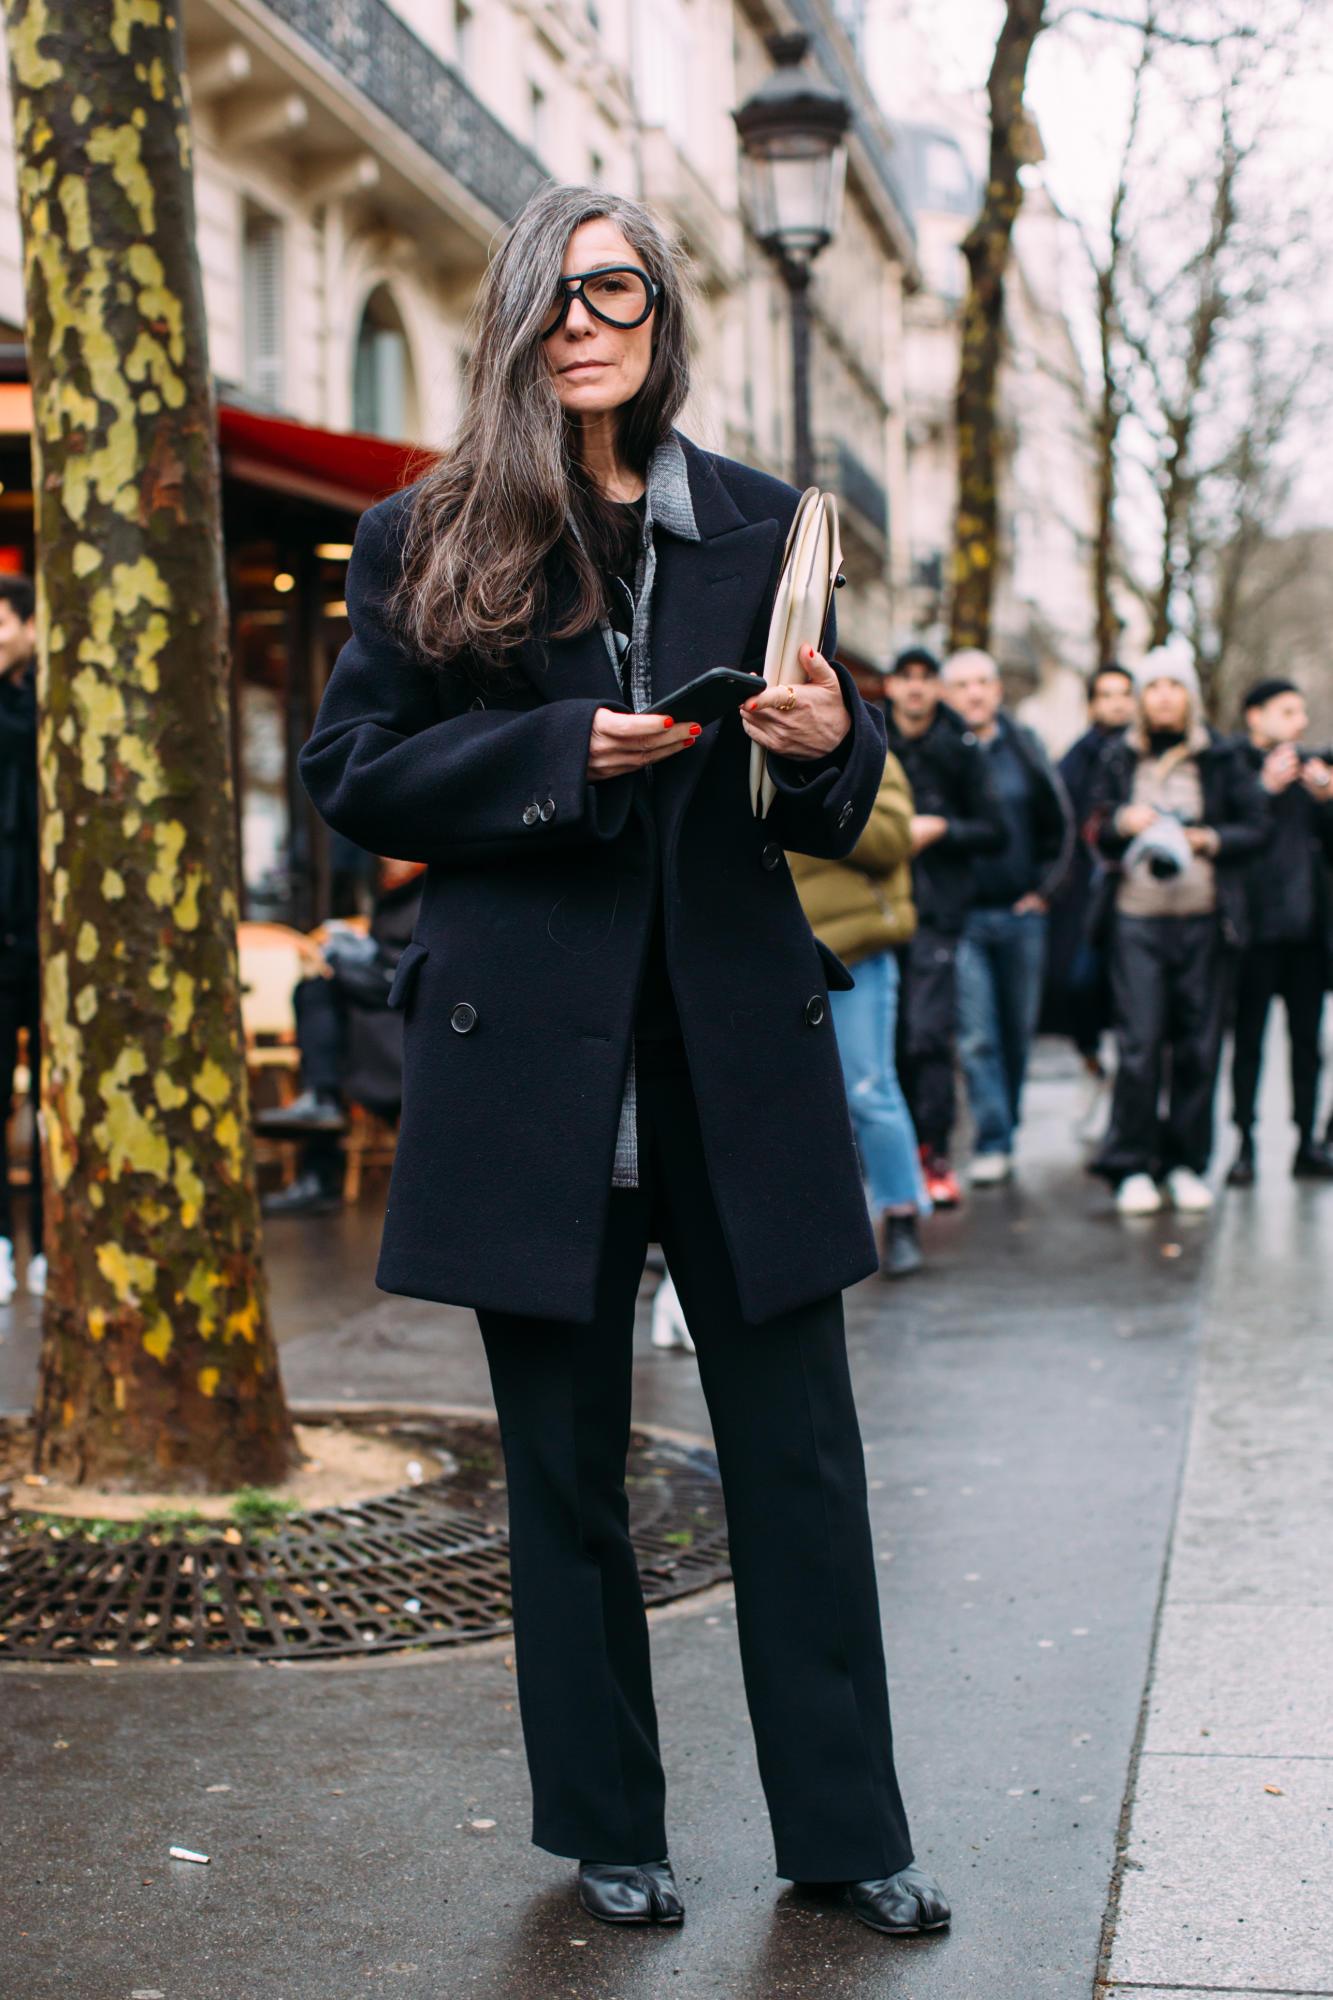 paris-fashion-week-street-style-fall-2018-day-4-66.jpg